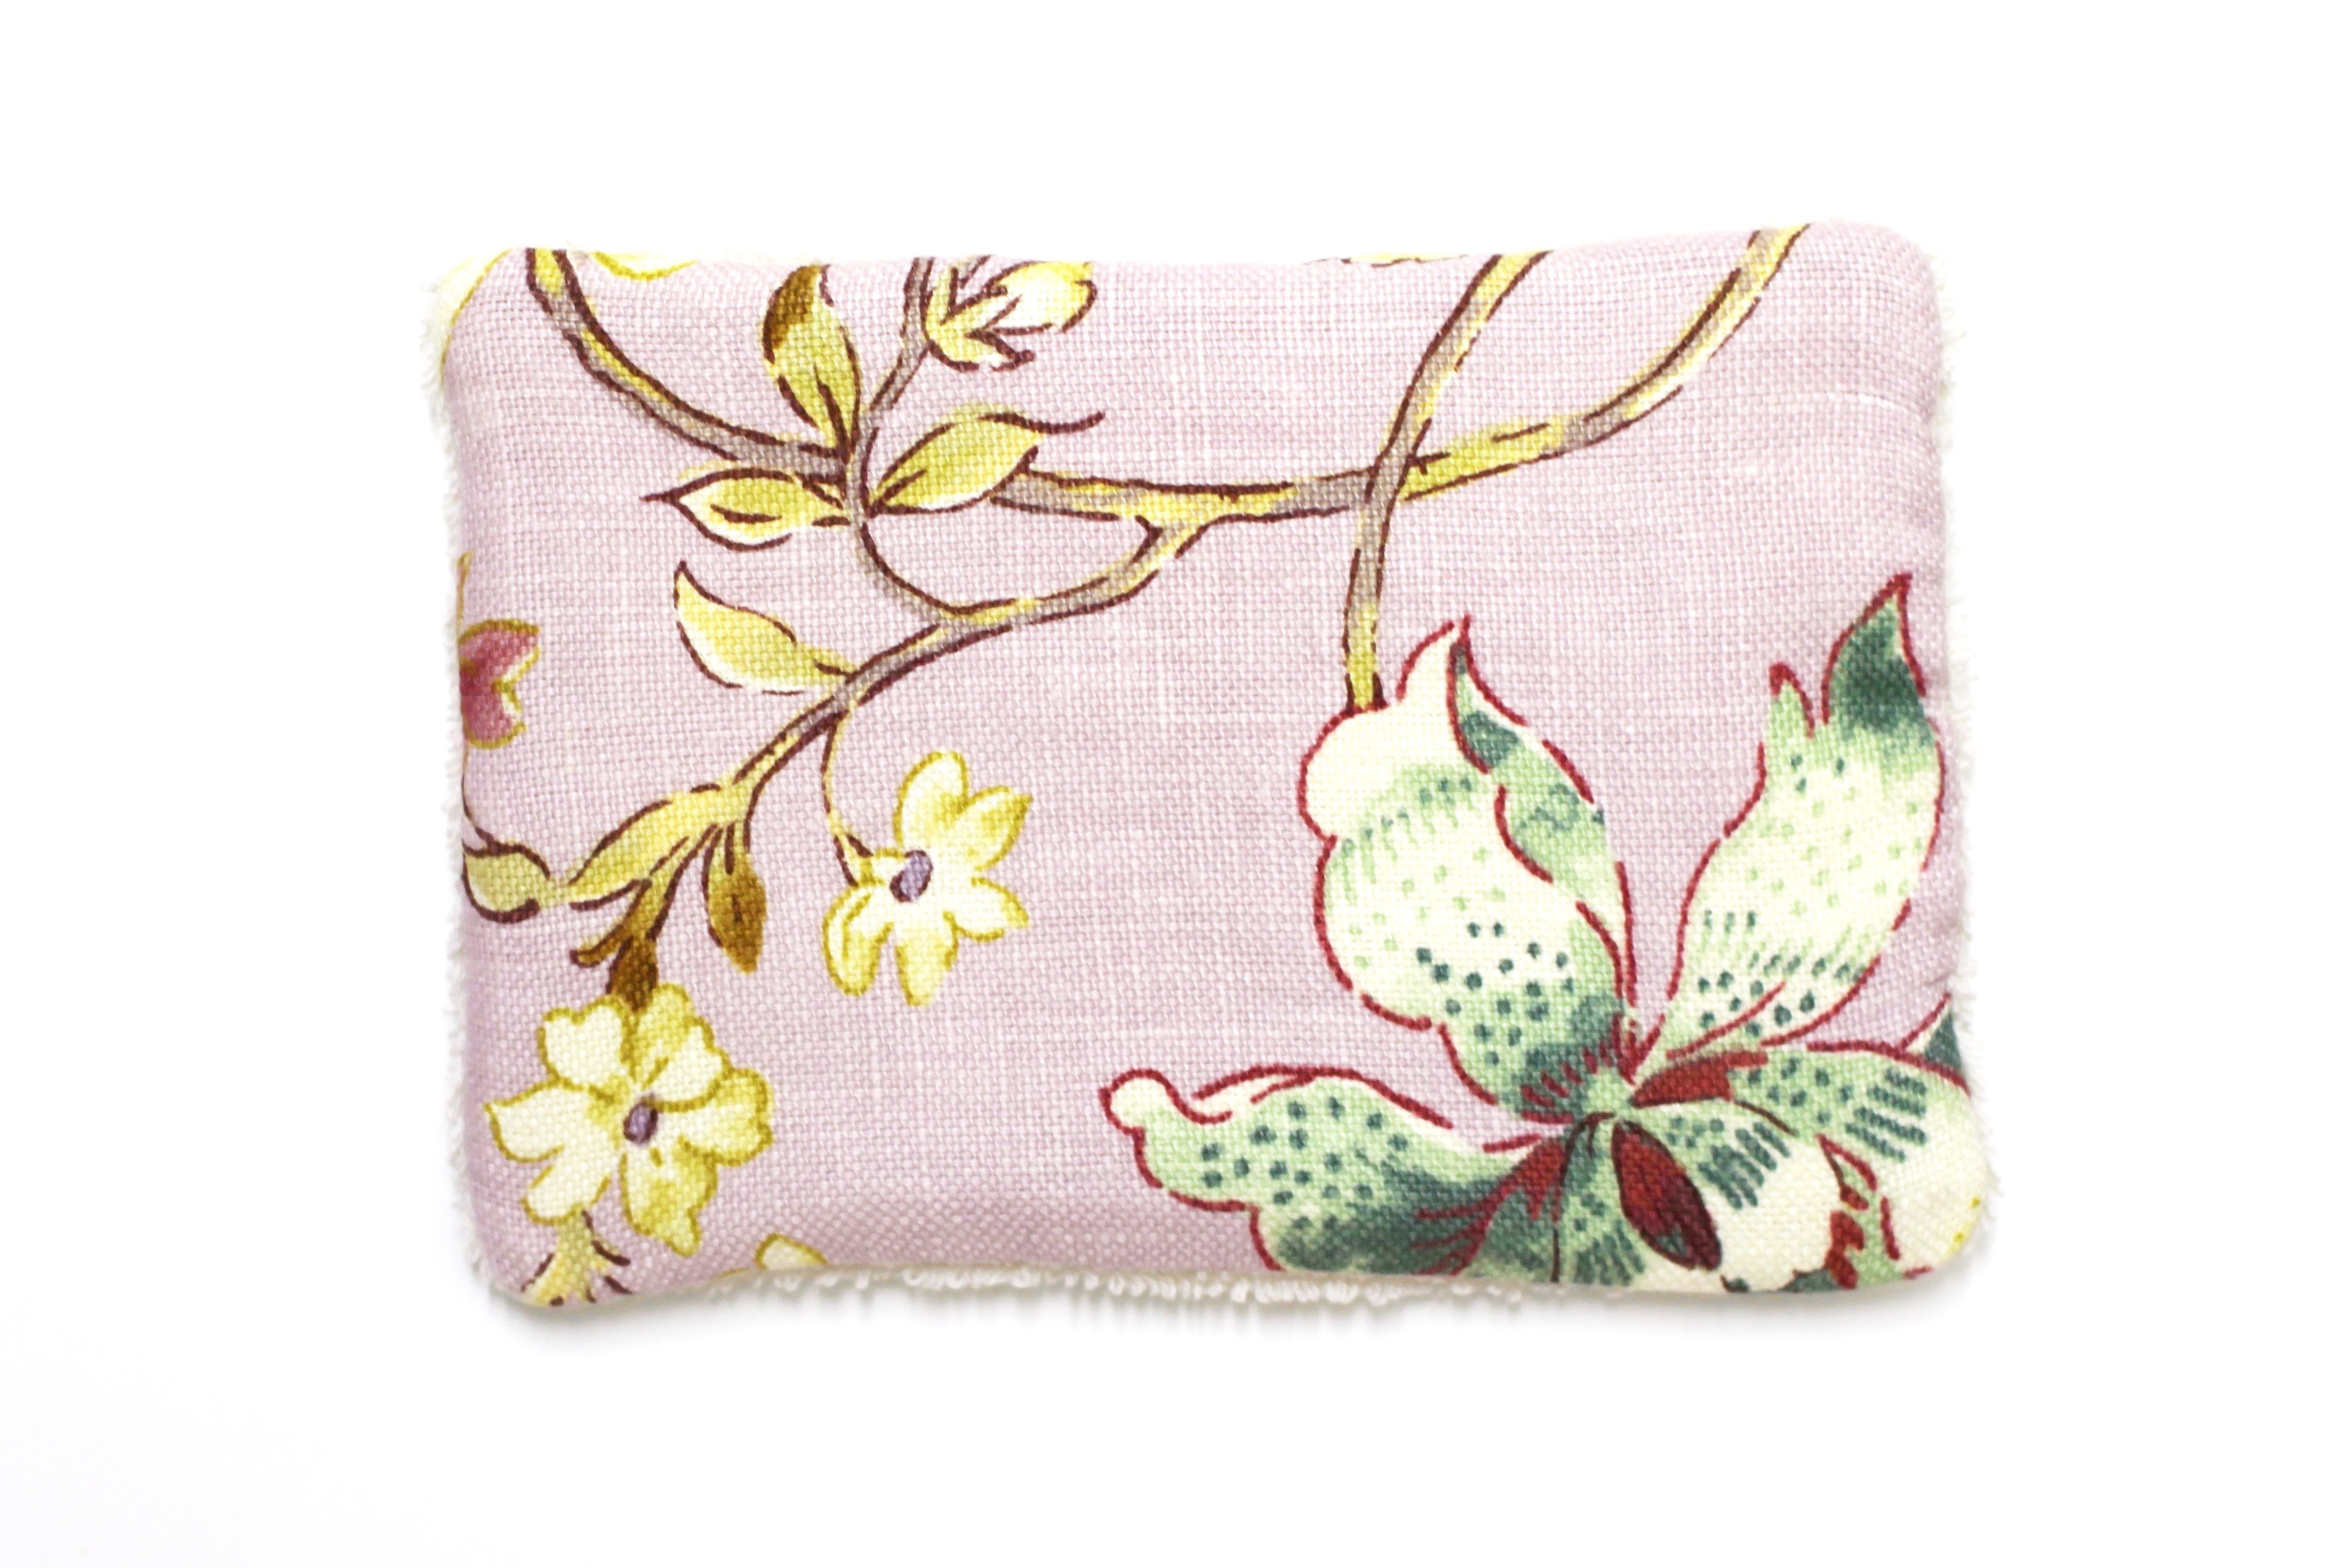 Ecofriendly Reusable Linen + Cotton Sponge Cloth baby